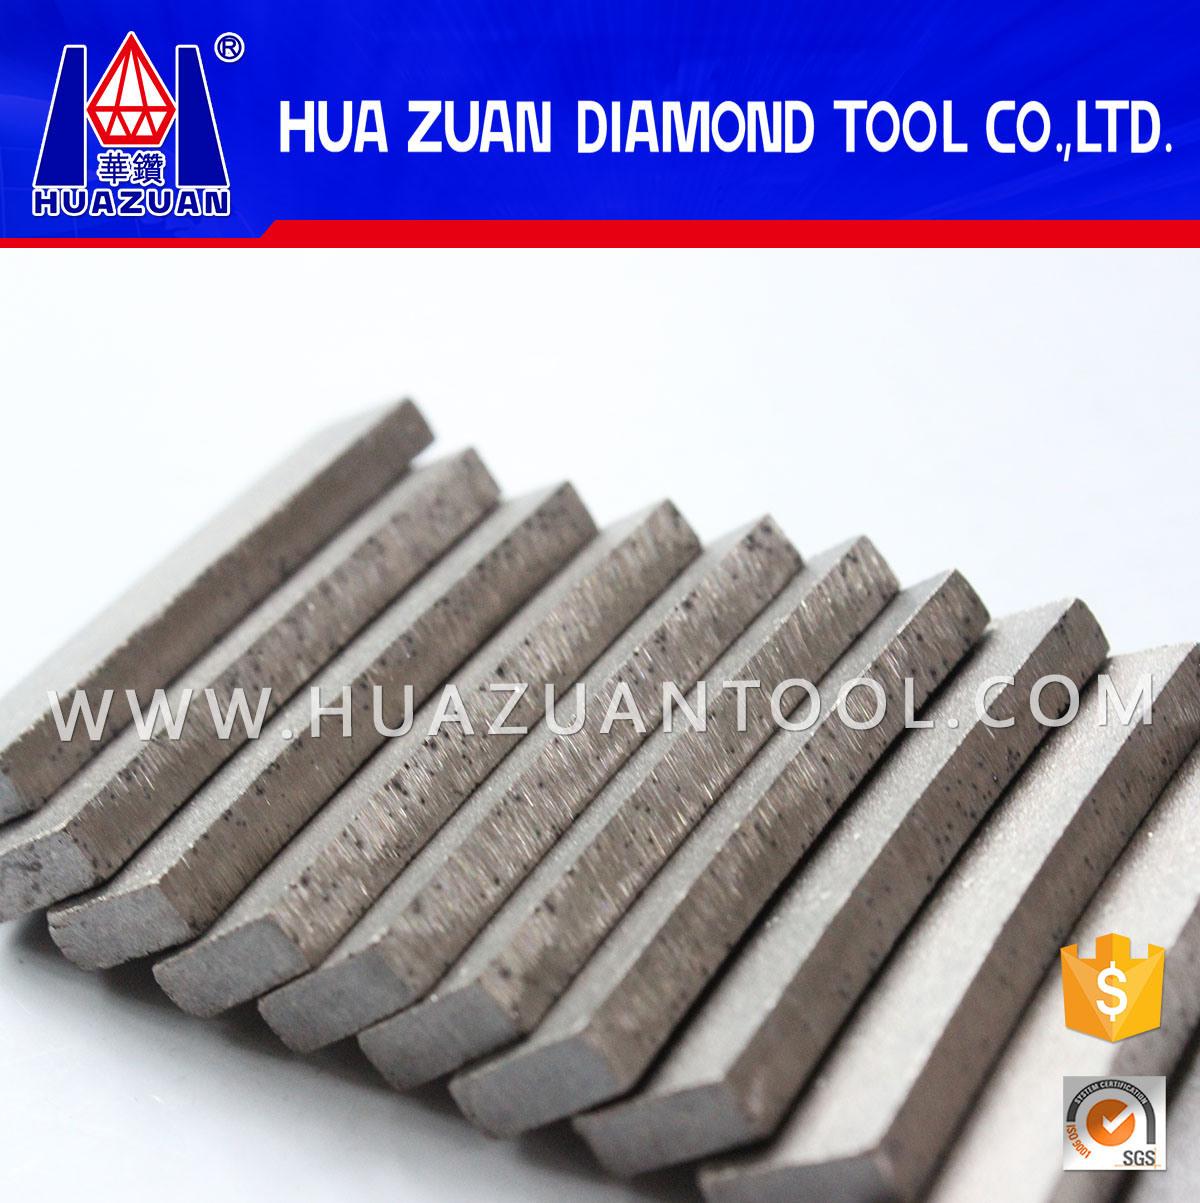 Fan Shape Diamond Segment for Cutting Granite